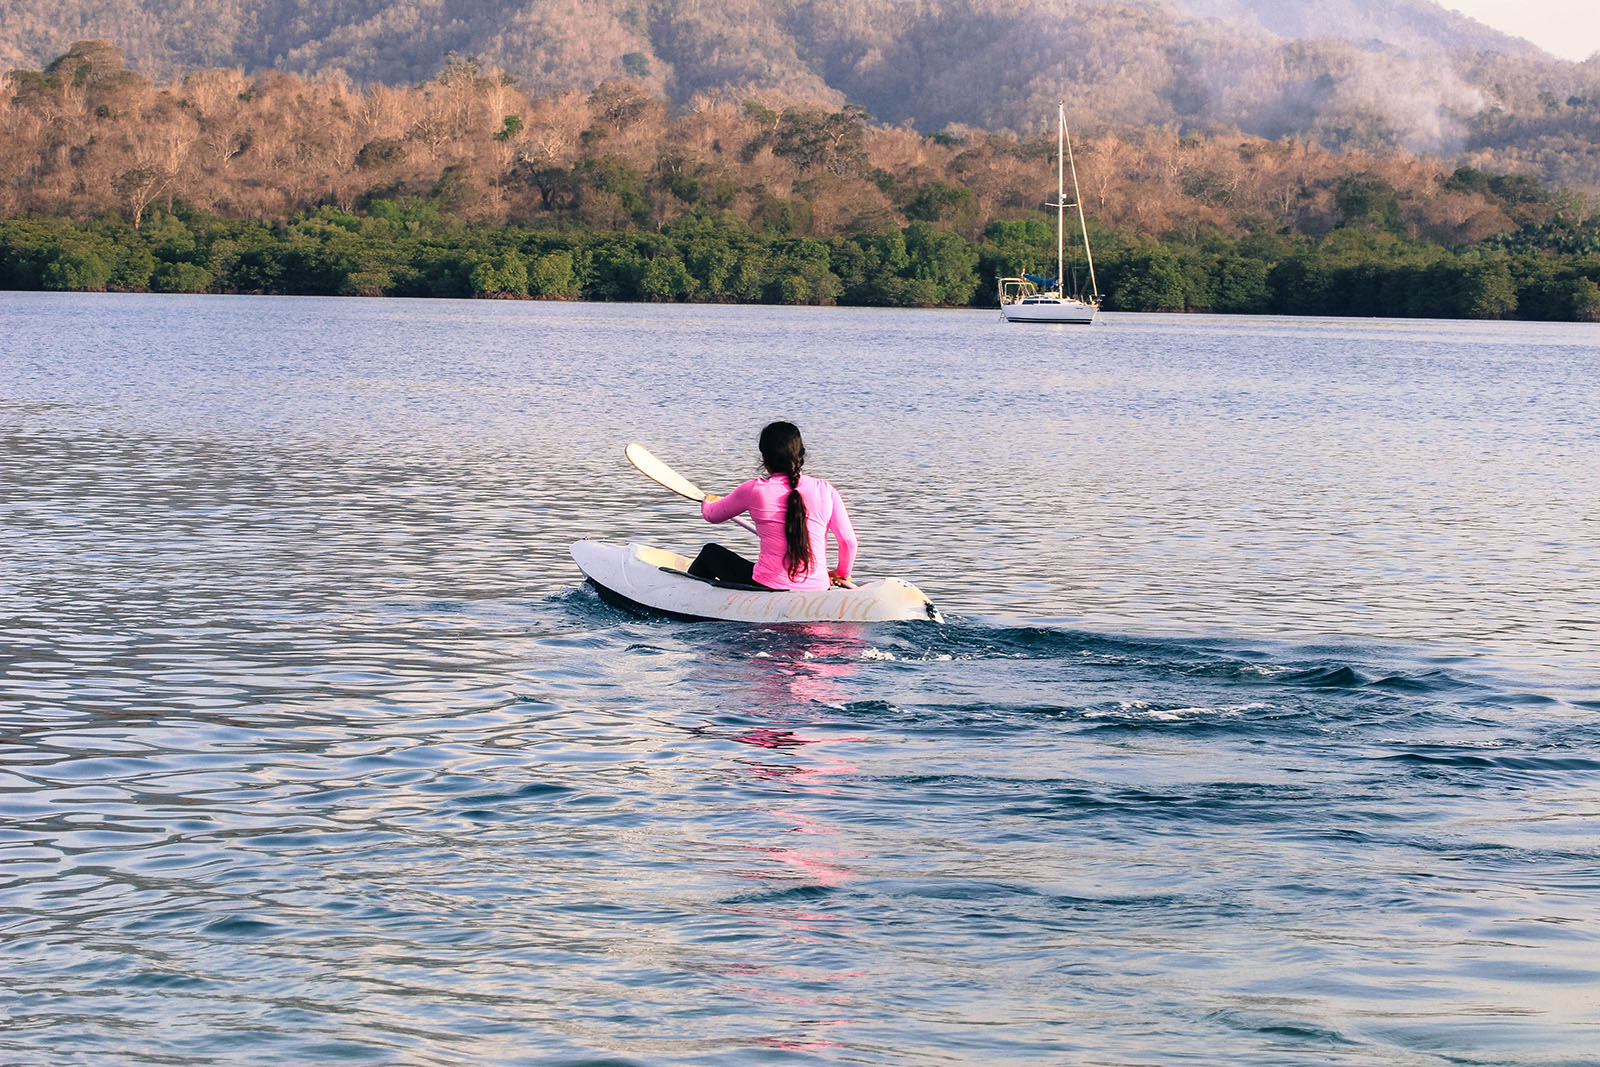 canoeing sport at beautiful coast